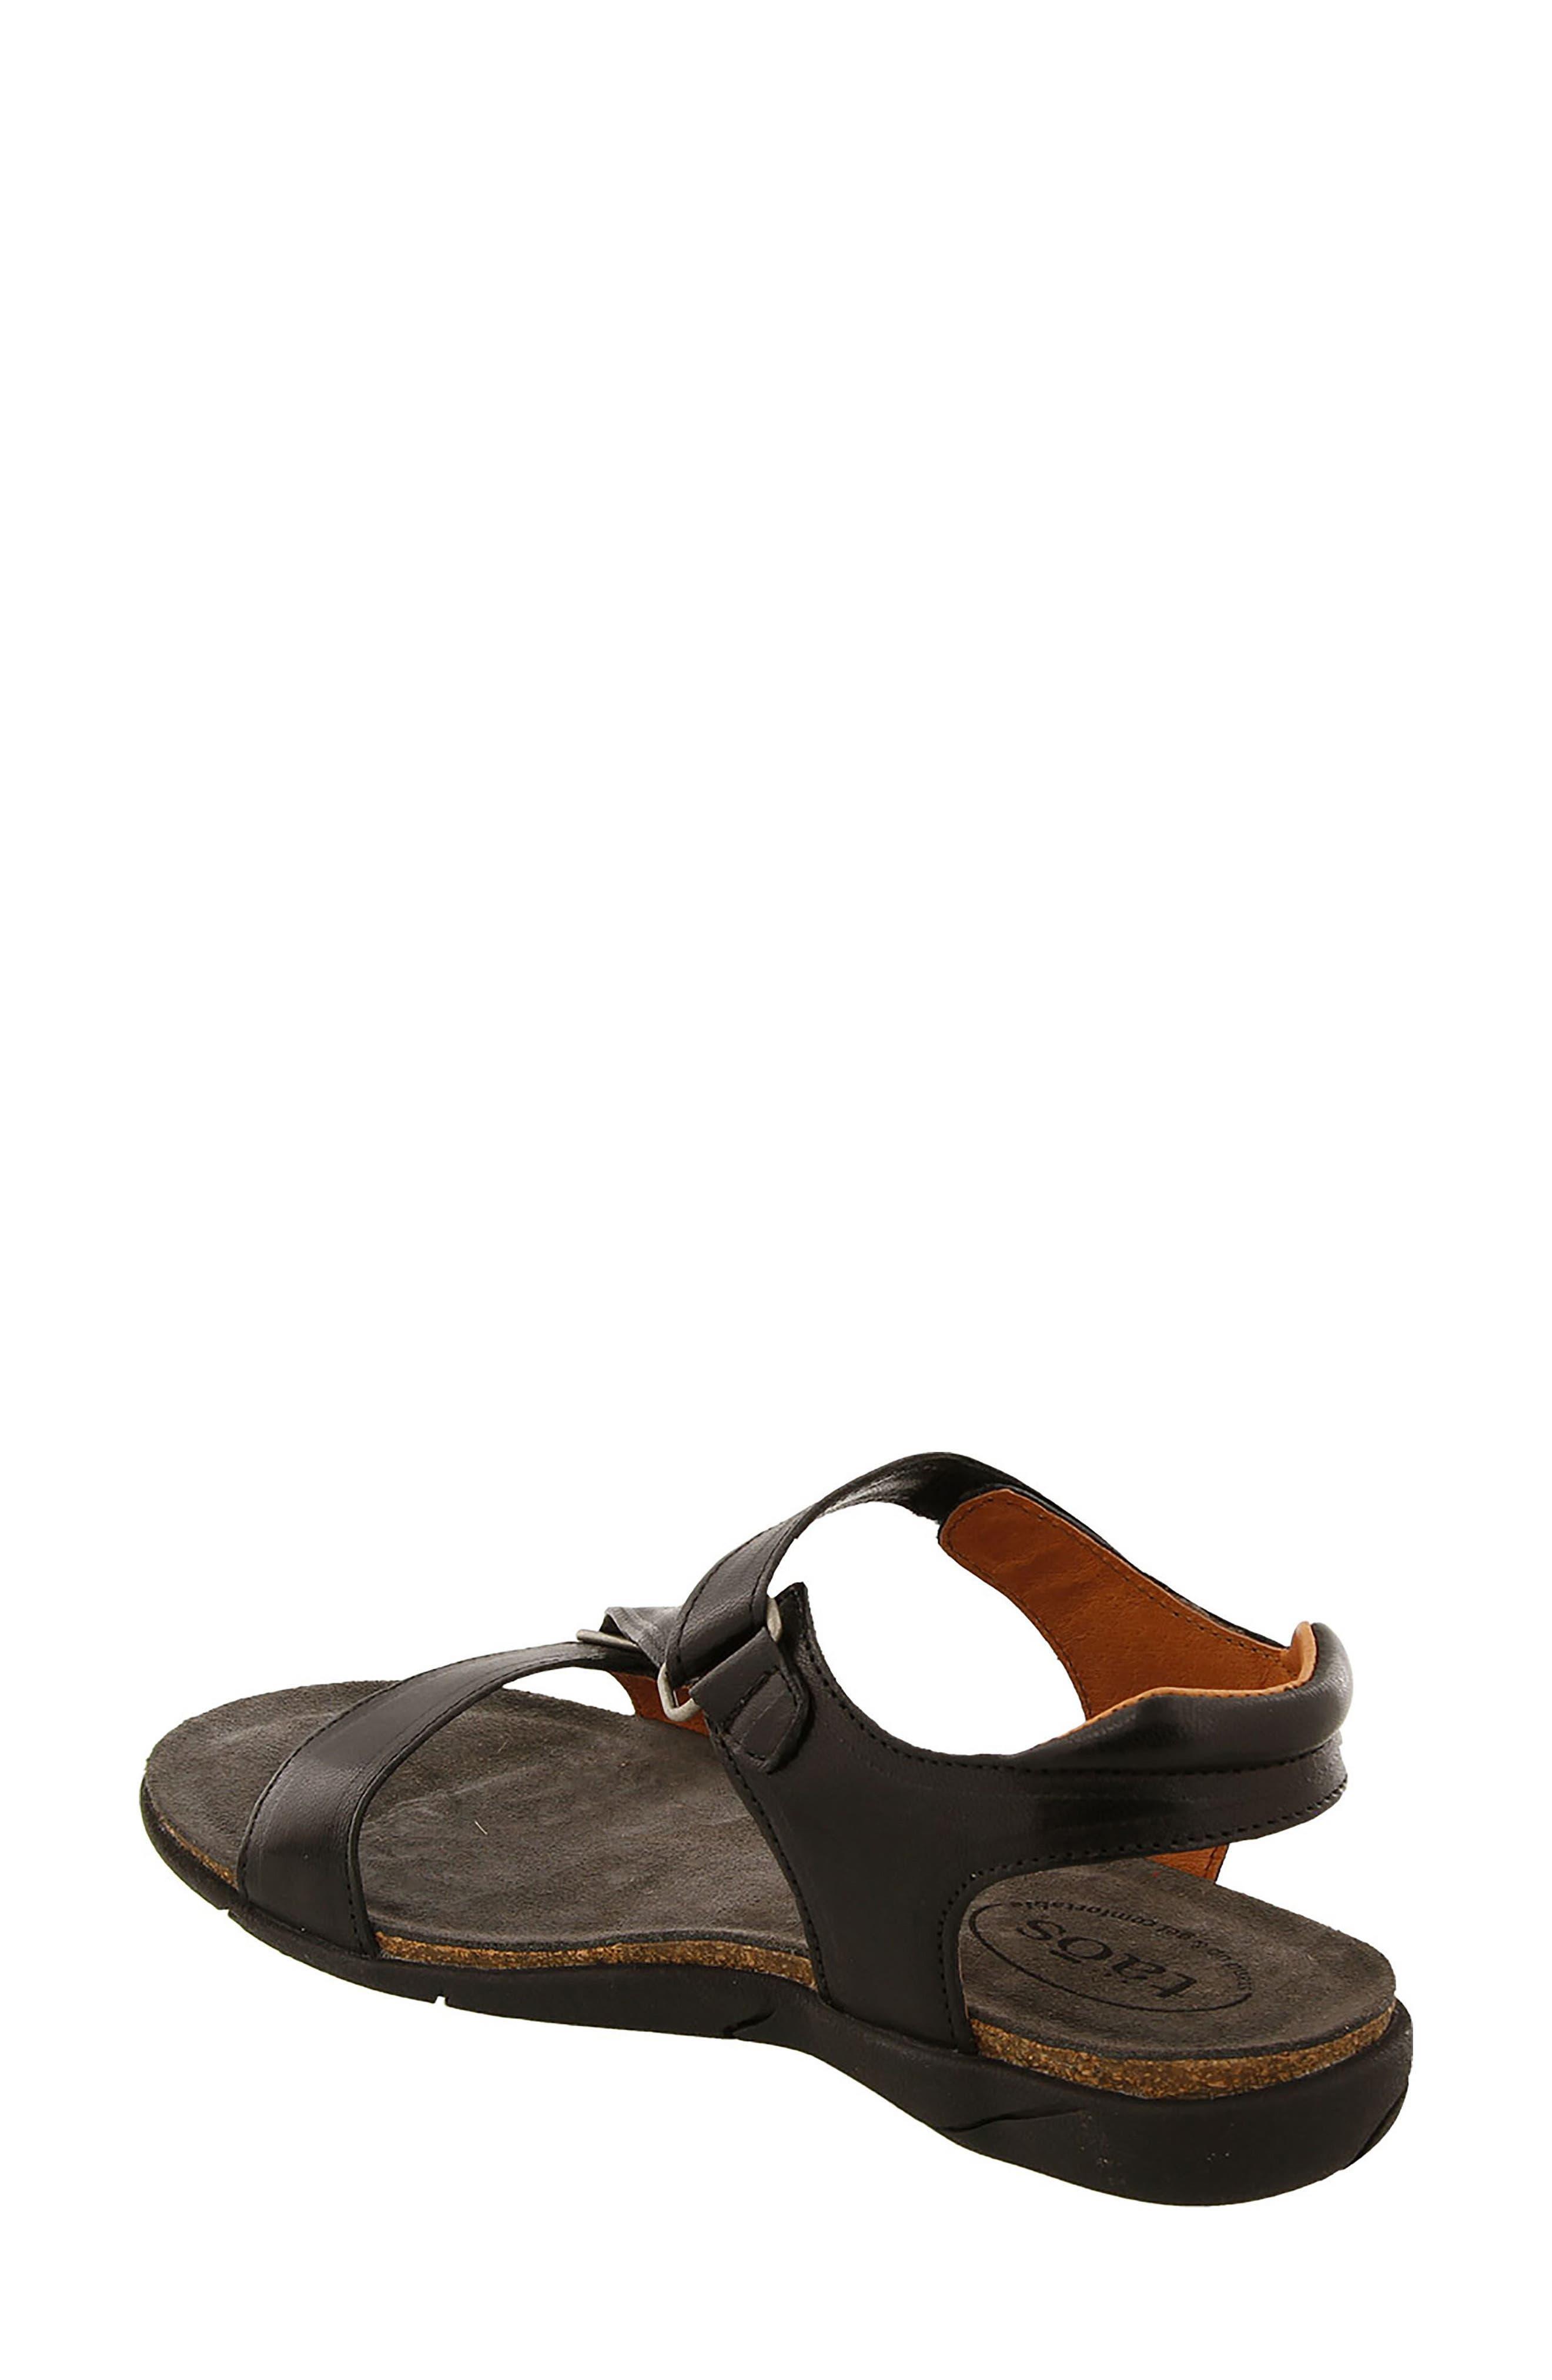 Zeal Sandal,                             Alternate thumbnail 2, color,                             Black Leather